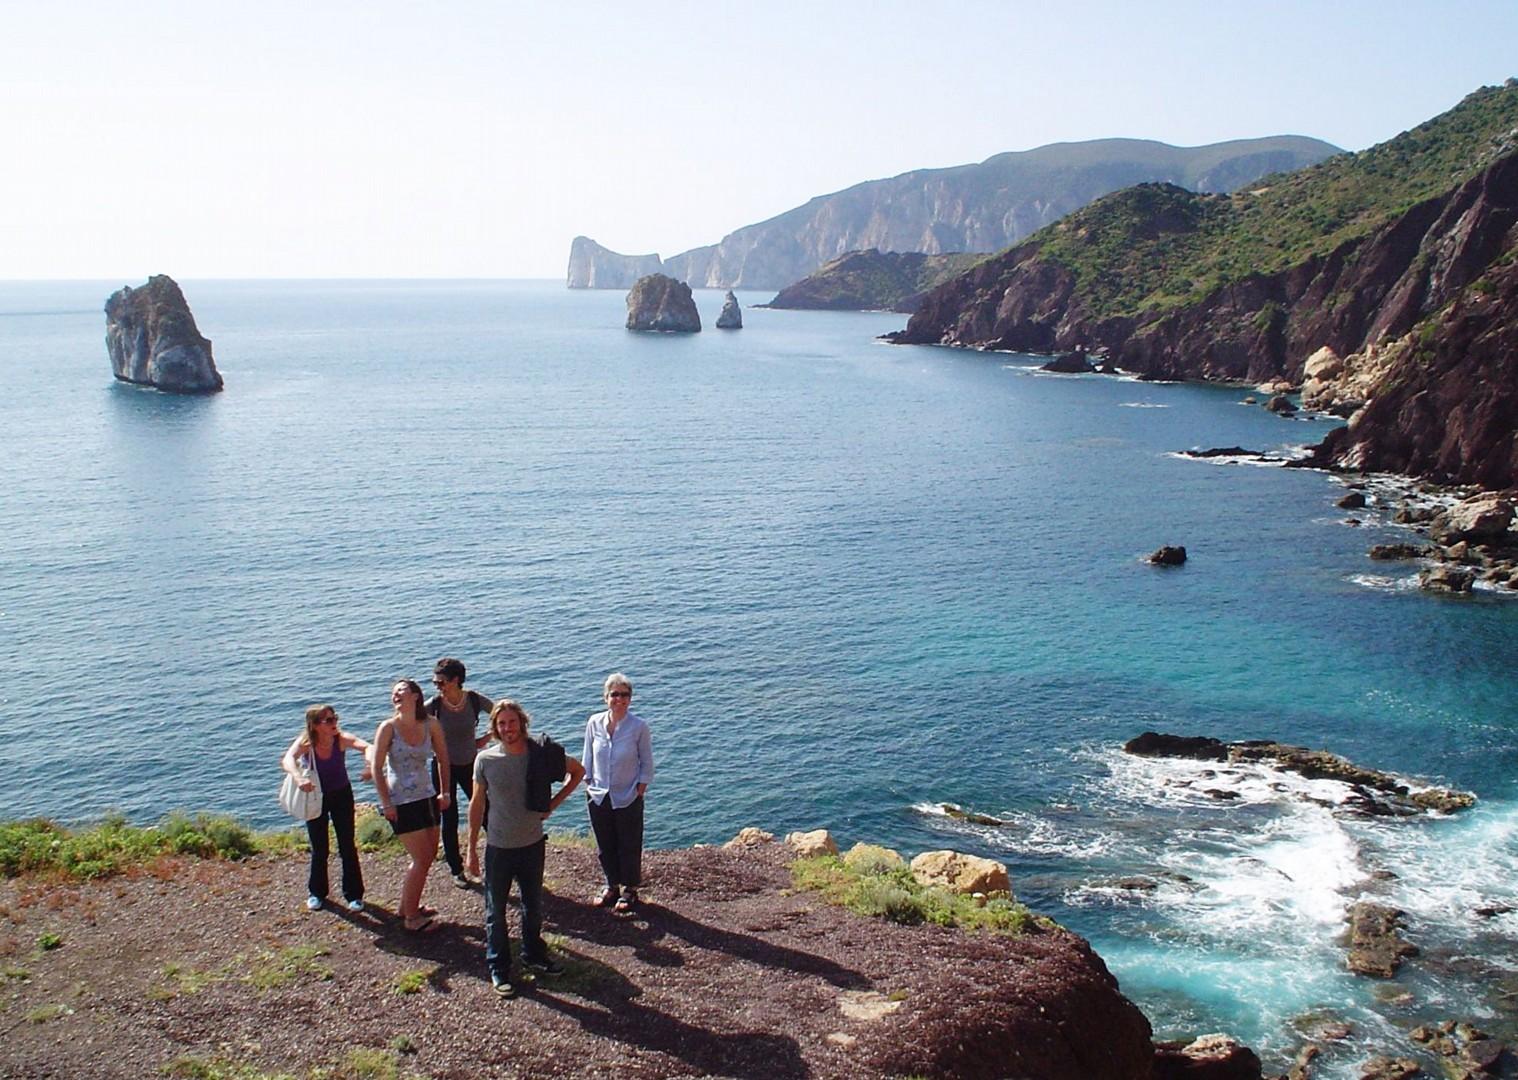 sardinia-island-self-guided-cycling-holiday.jpg - Italy - Sardinia - Island Flavours - Self-Guided Leisure Cycling Holiday - Italia Leisure and Family Cycling